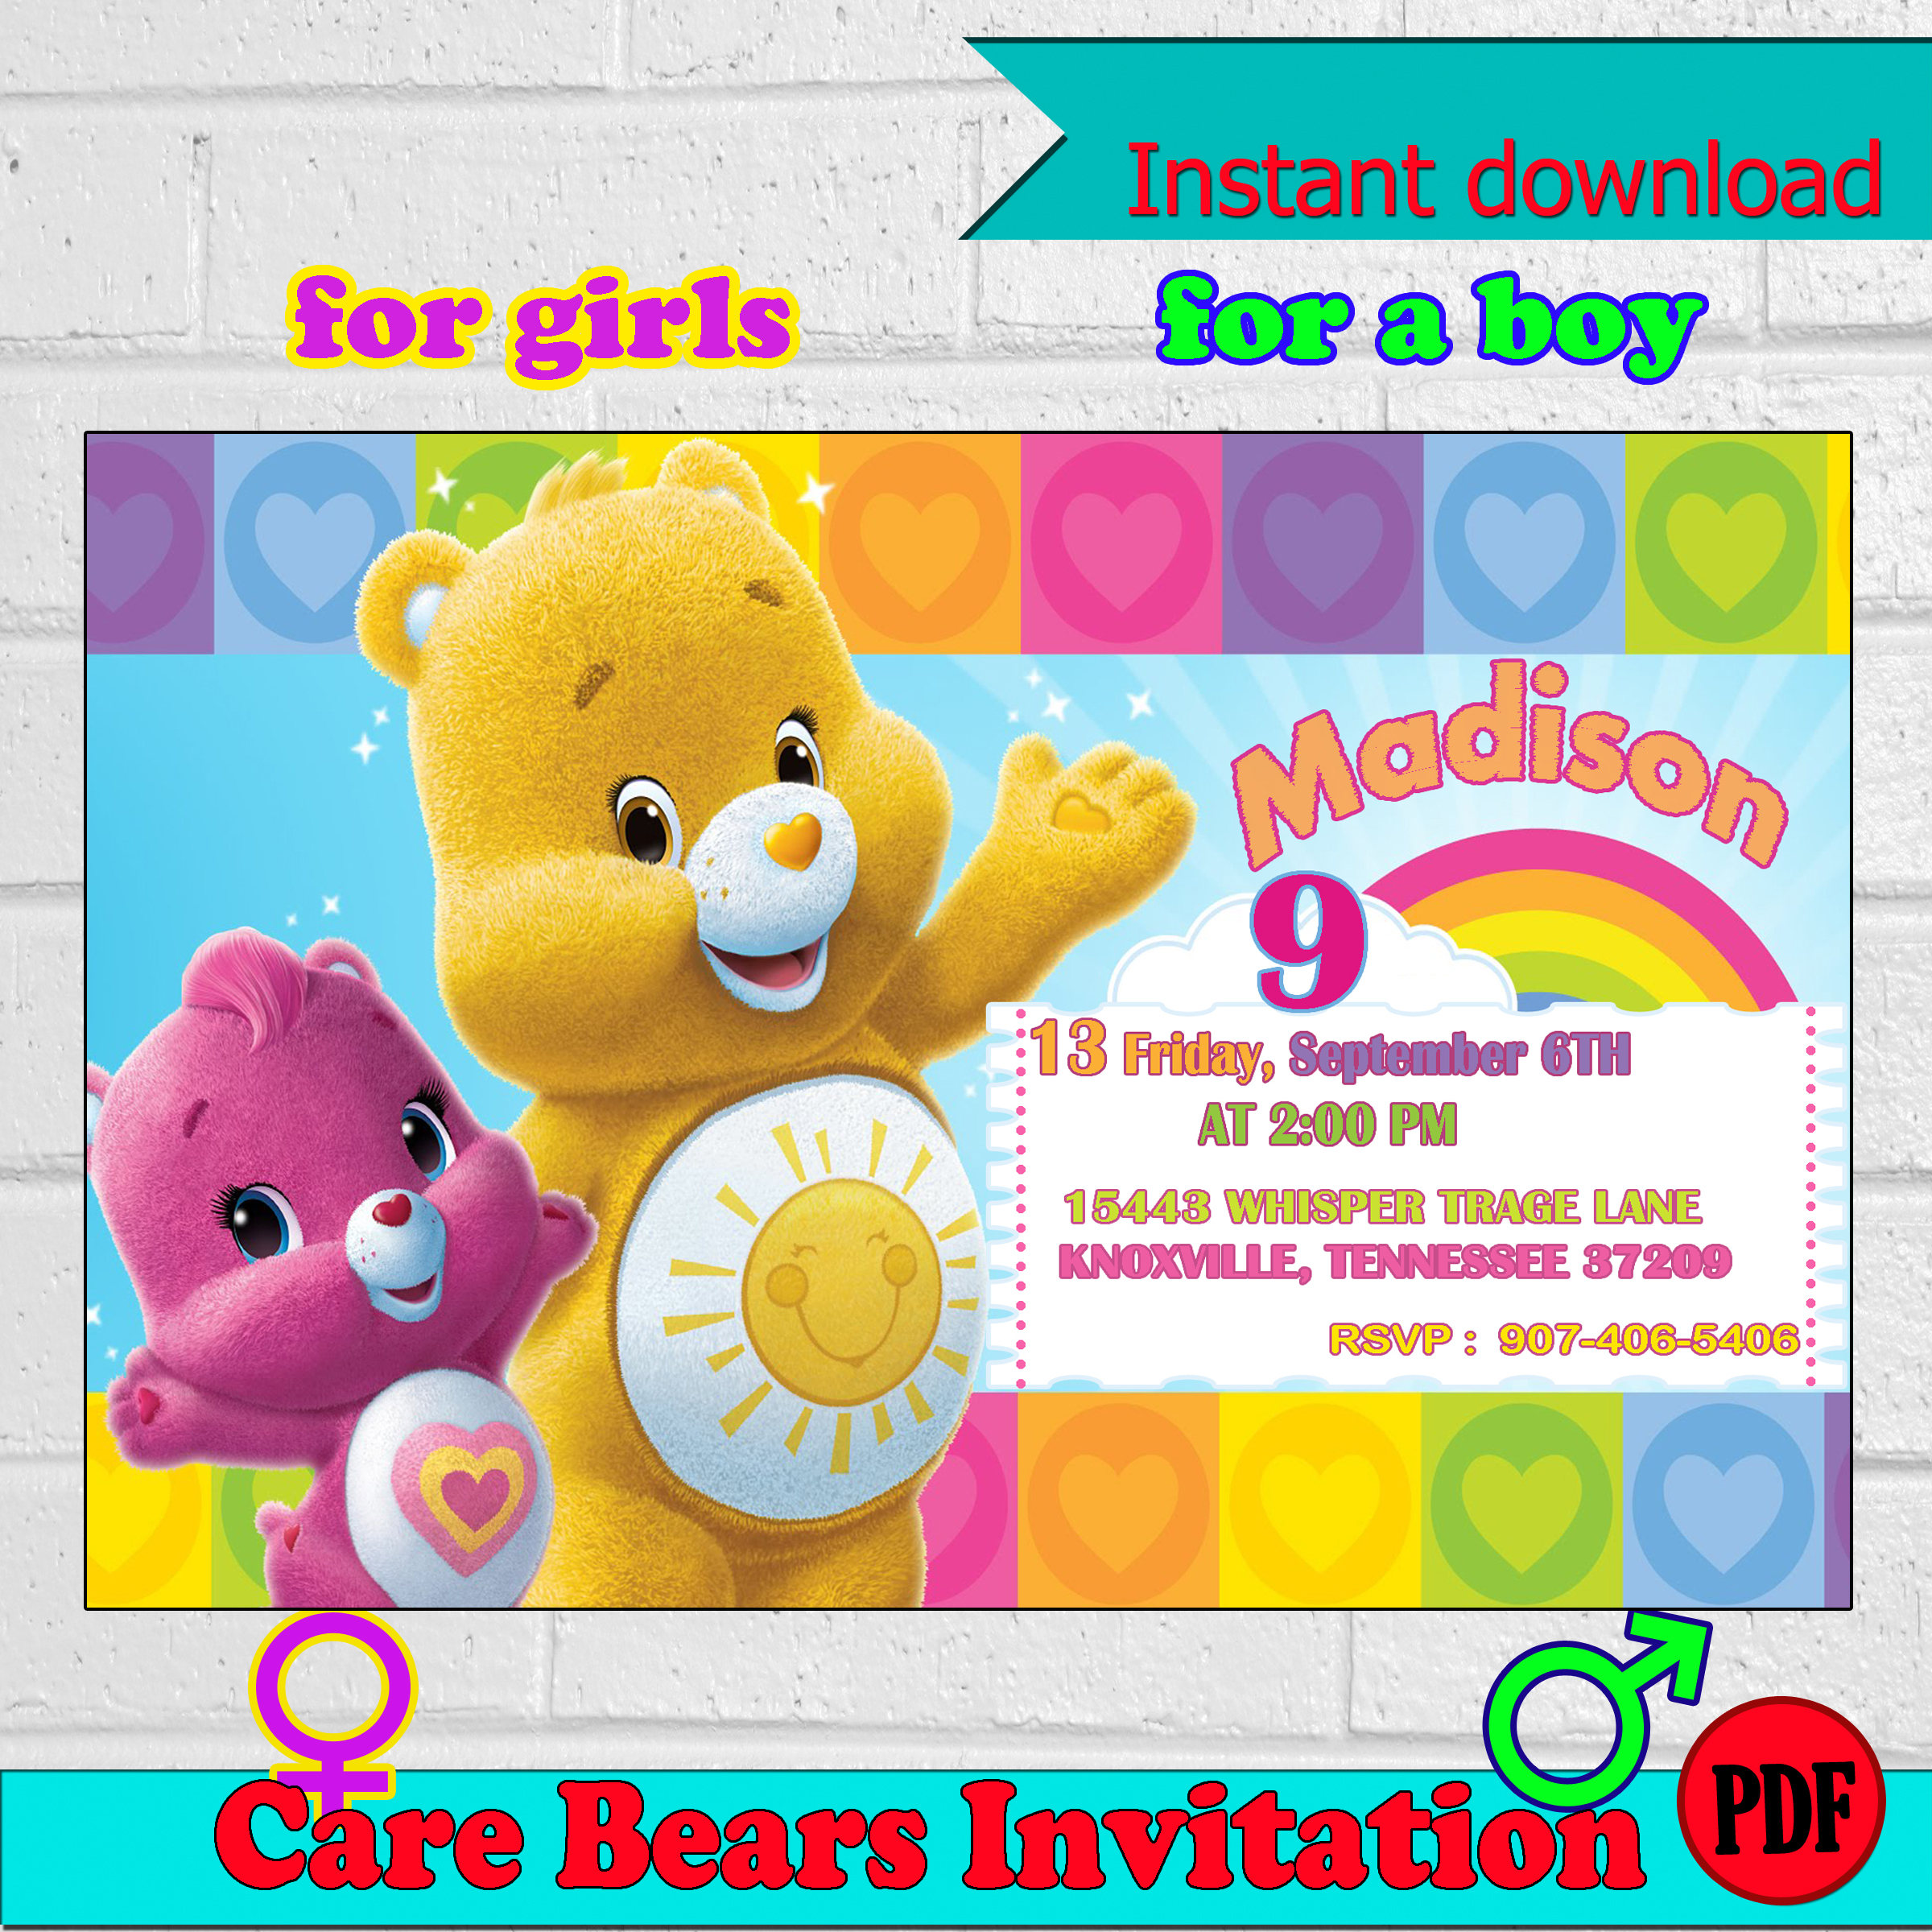 Care bears invitation care bears birthday party invitation zoom monicamarmolfo Choice Image